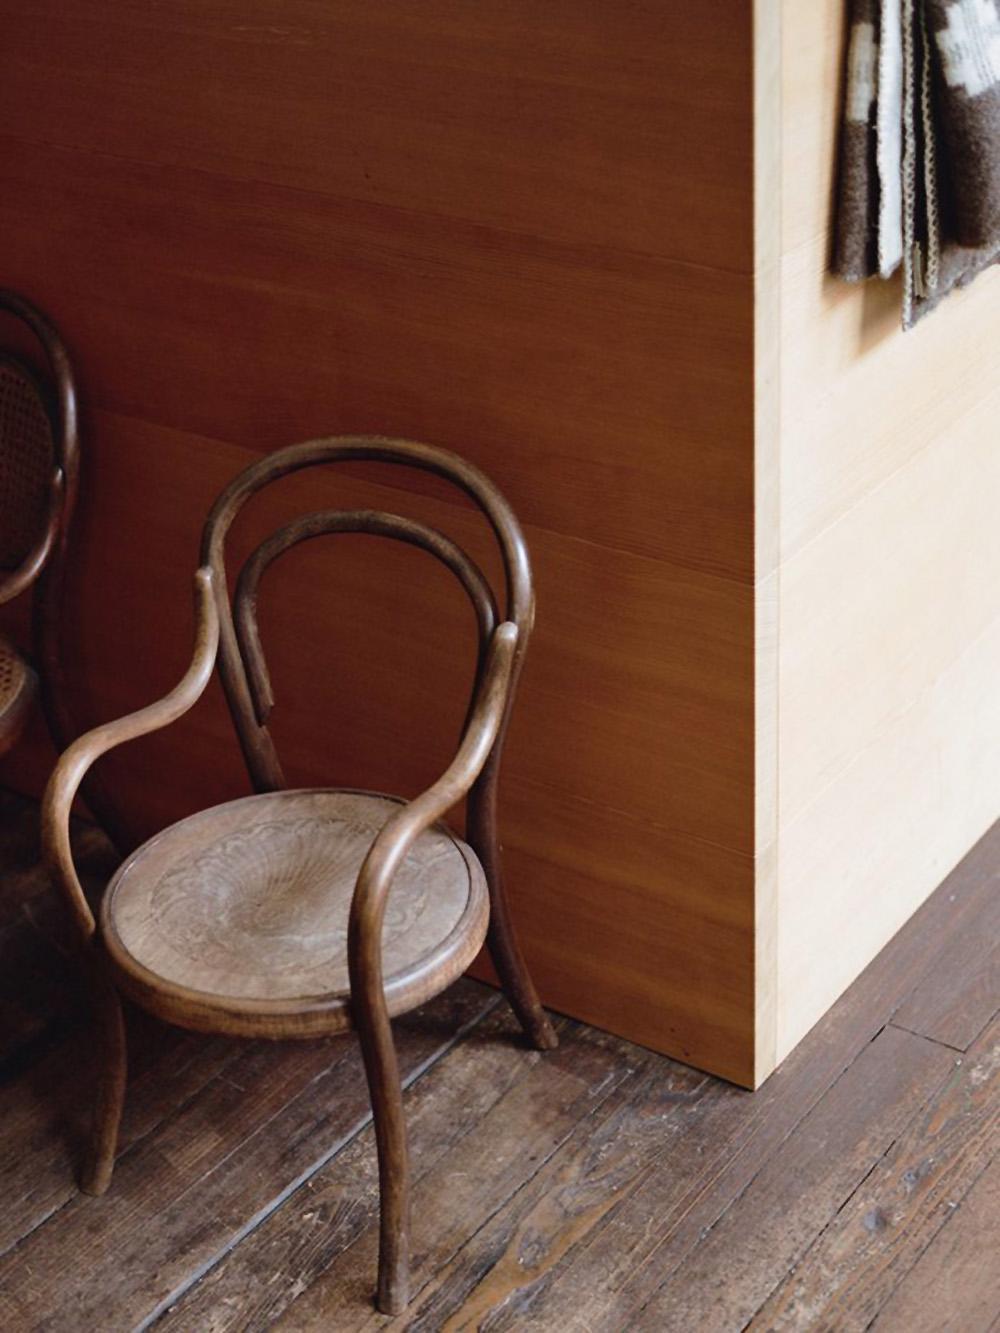 Donald Judd, Judd Foundation, interiors, sunday sanctuary, oracle fox, chair